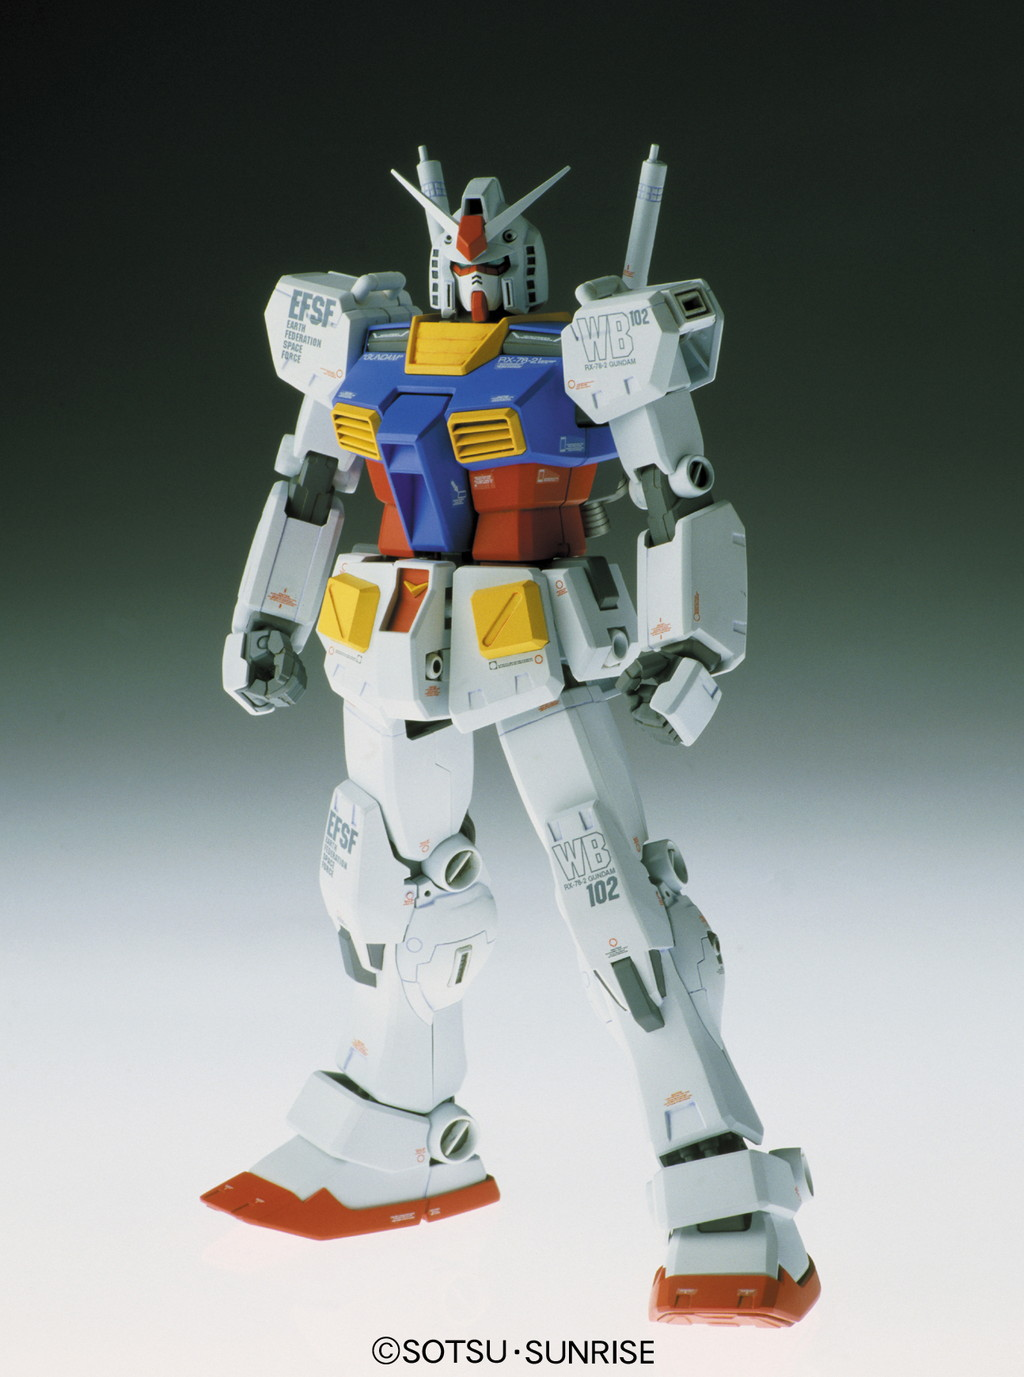 58154MG 1/100 RX-78-2 ガンダム Ver.Ka [Gundam] 0114215 4543112142153